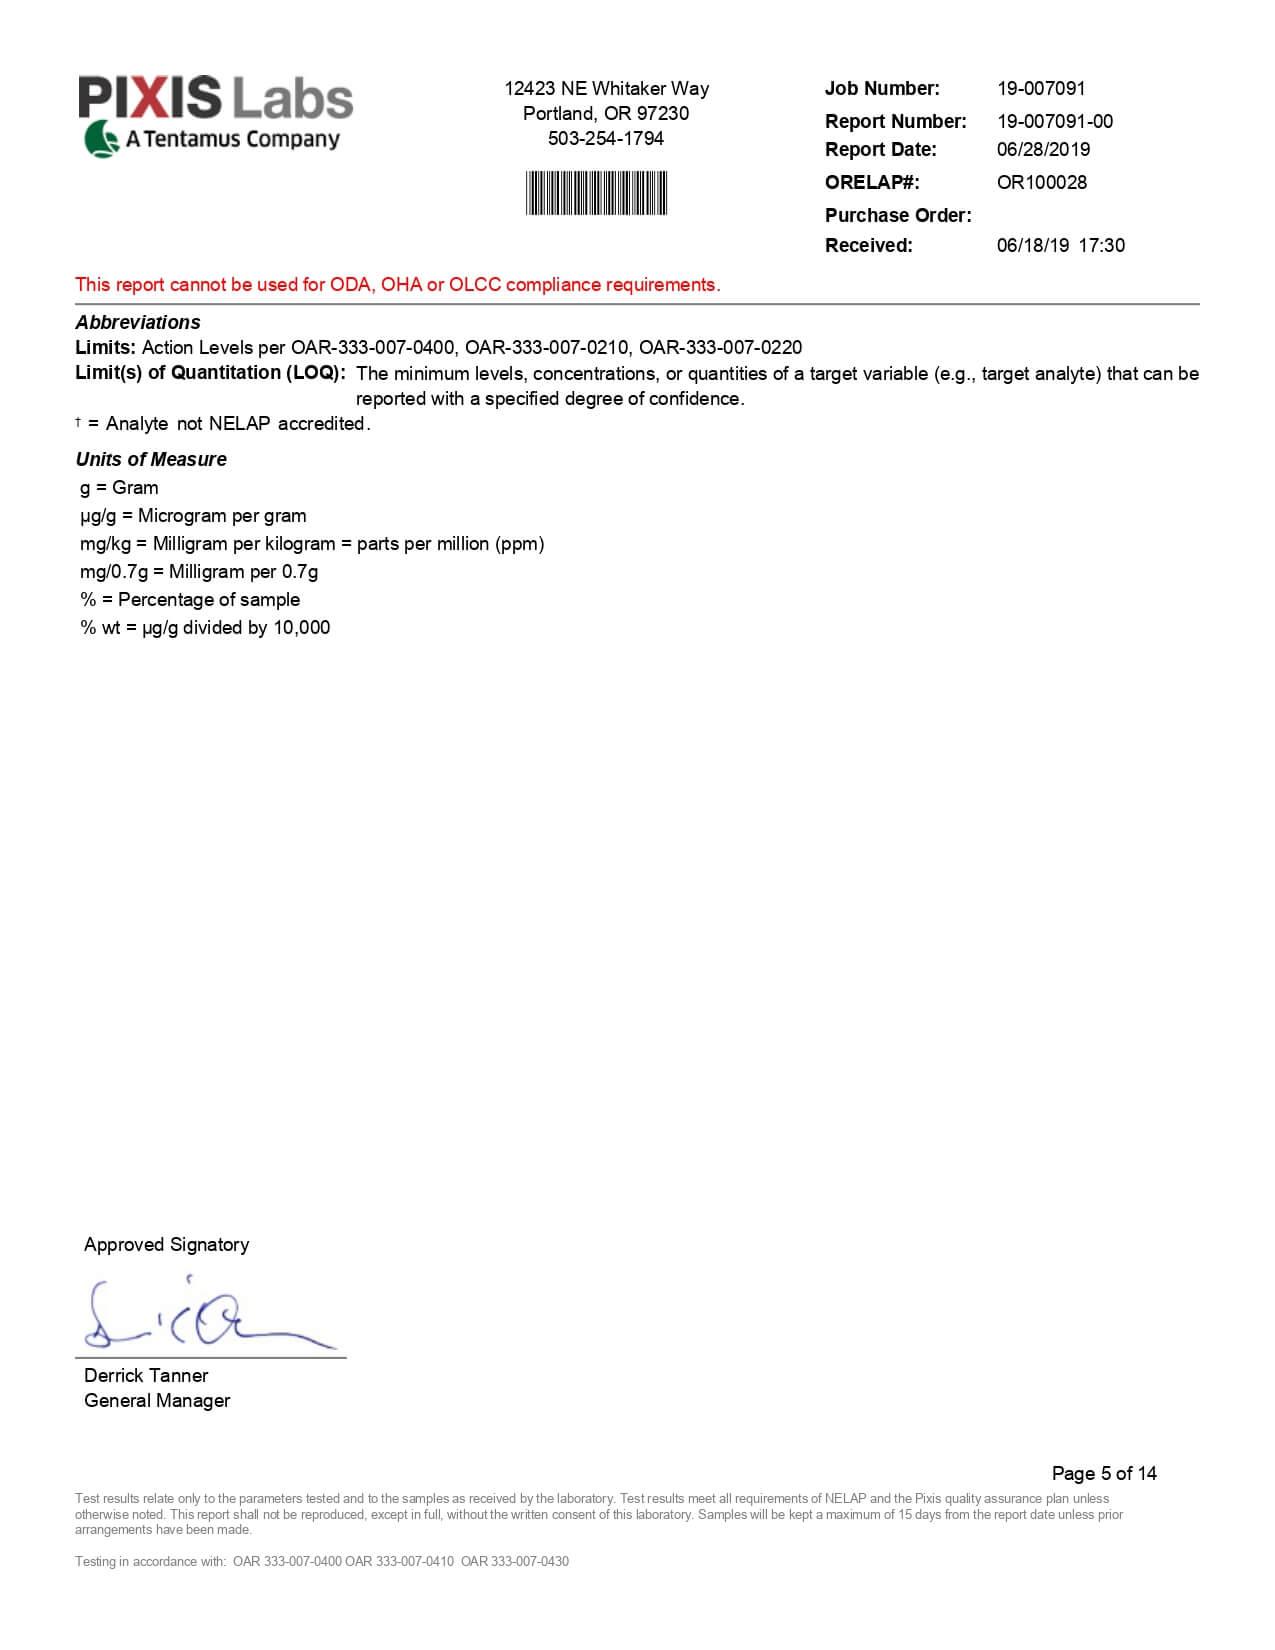 Select CBD Capsule Boost Soft Gel 2 Pack 33.3mg Lab Report